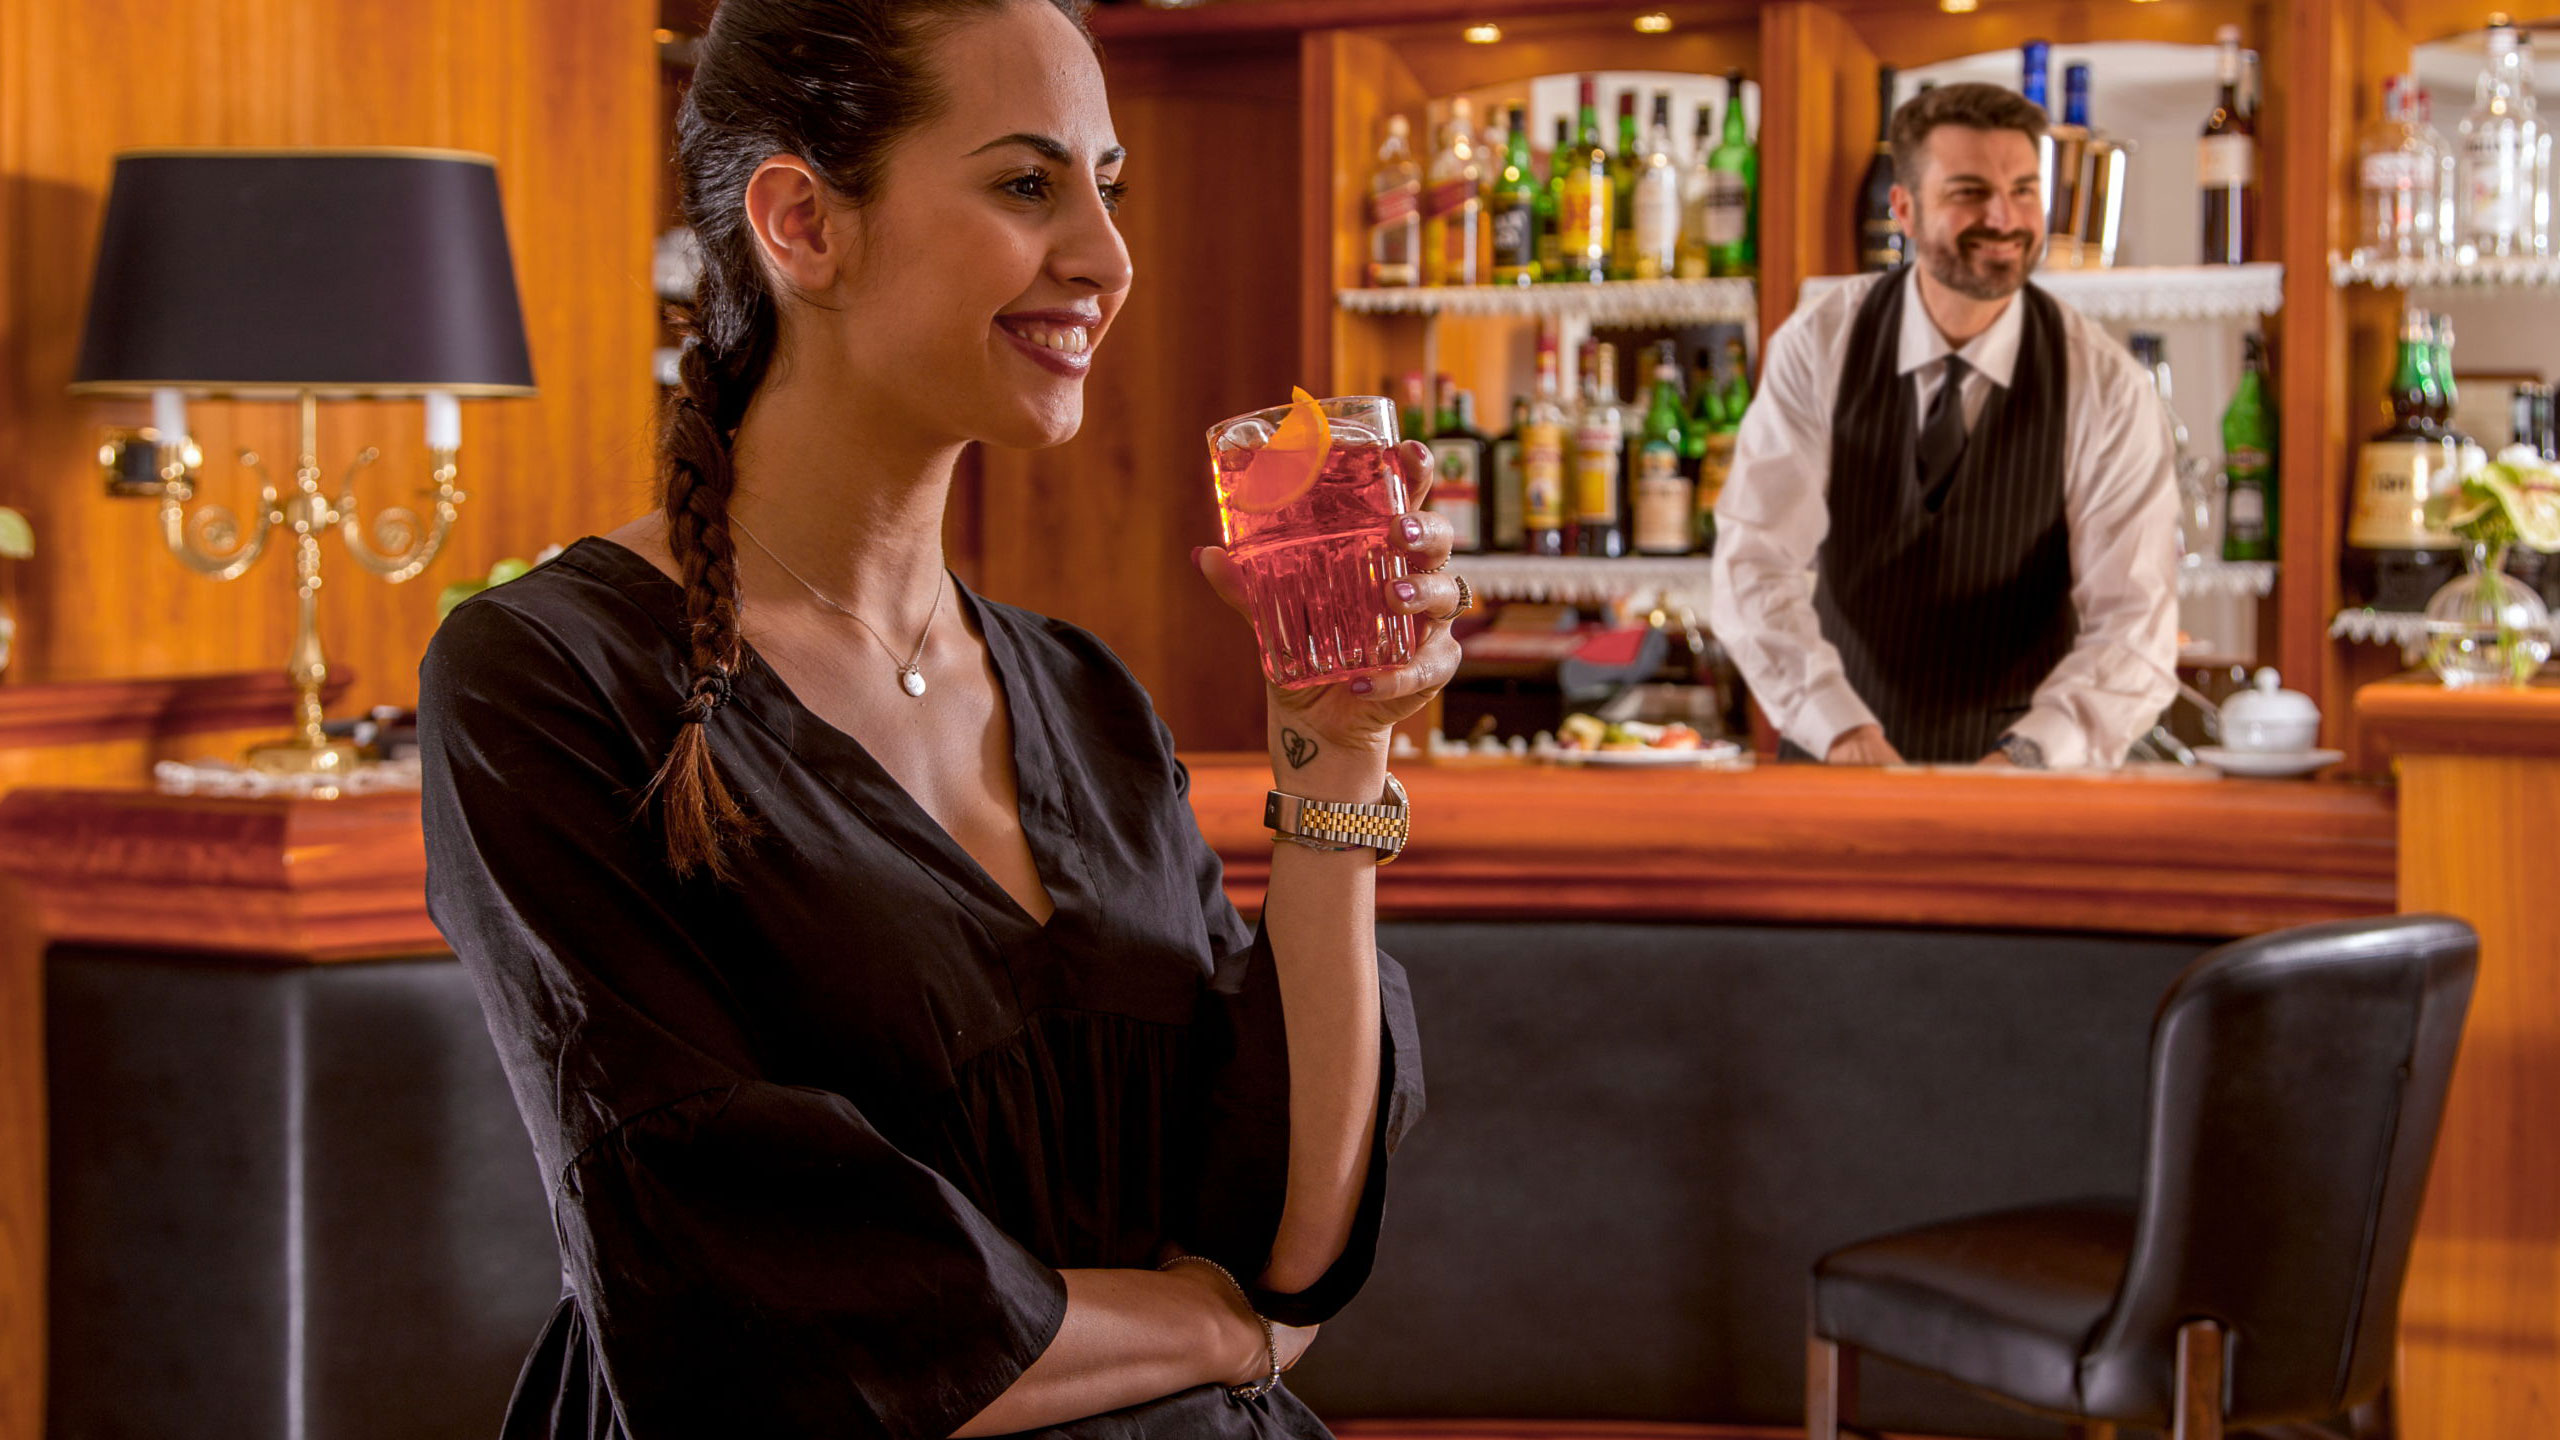 albergo-ottocento-rome-bar-04